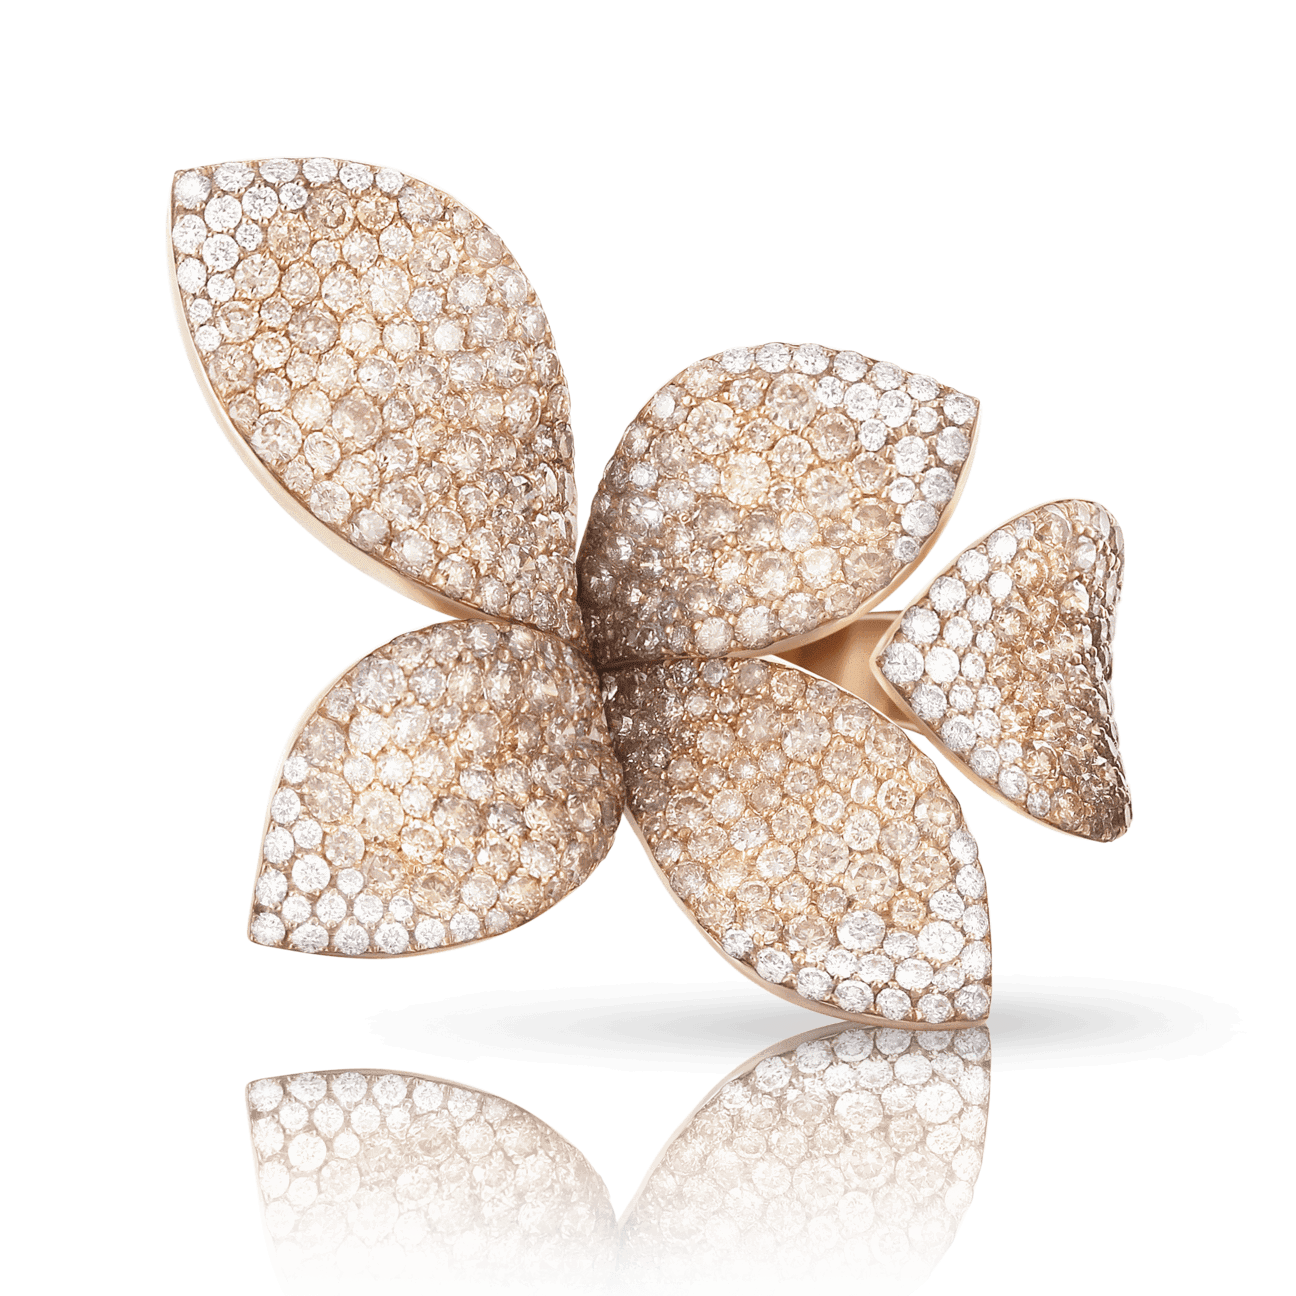 GIARDINI SEGRETI RING WITH WHITE AND CHAMPAGNE DIAMONDS